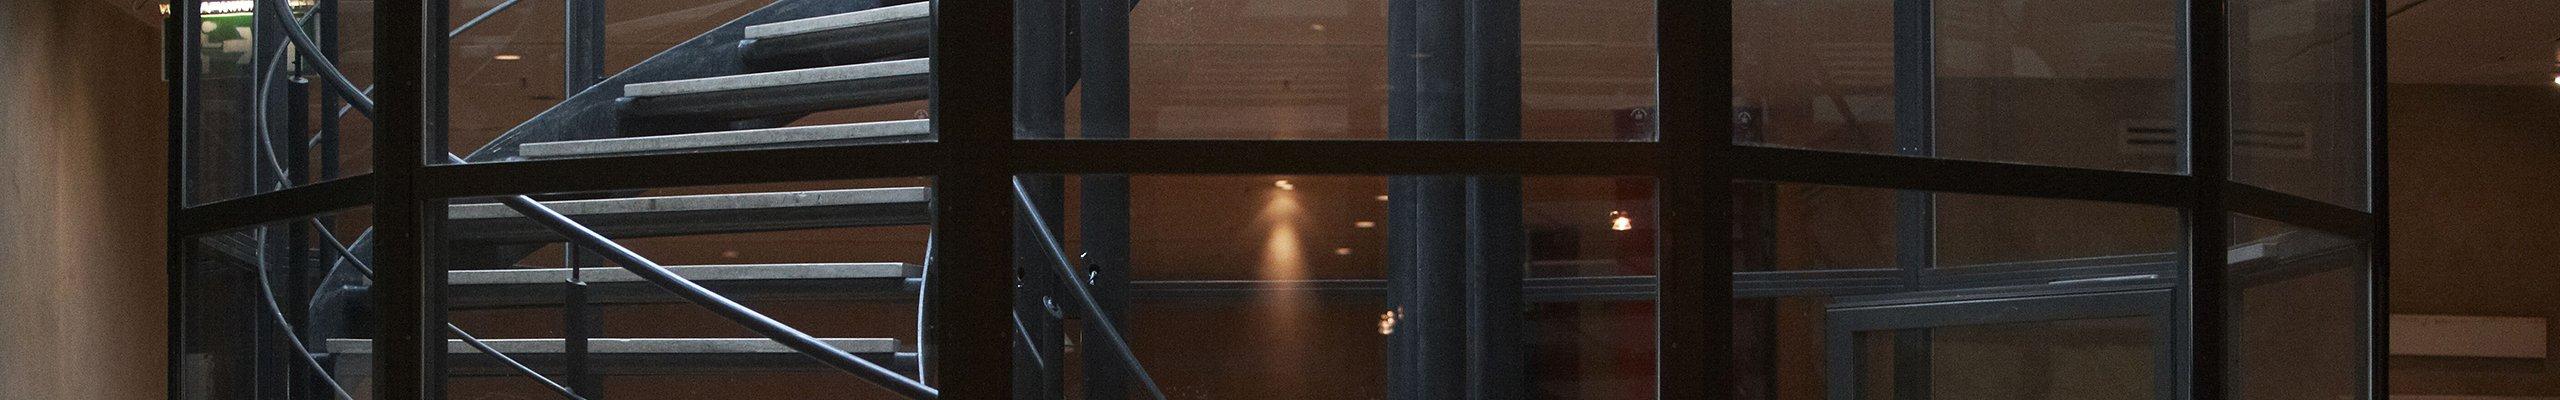 DBI Stairway with glass walls 2560x400